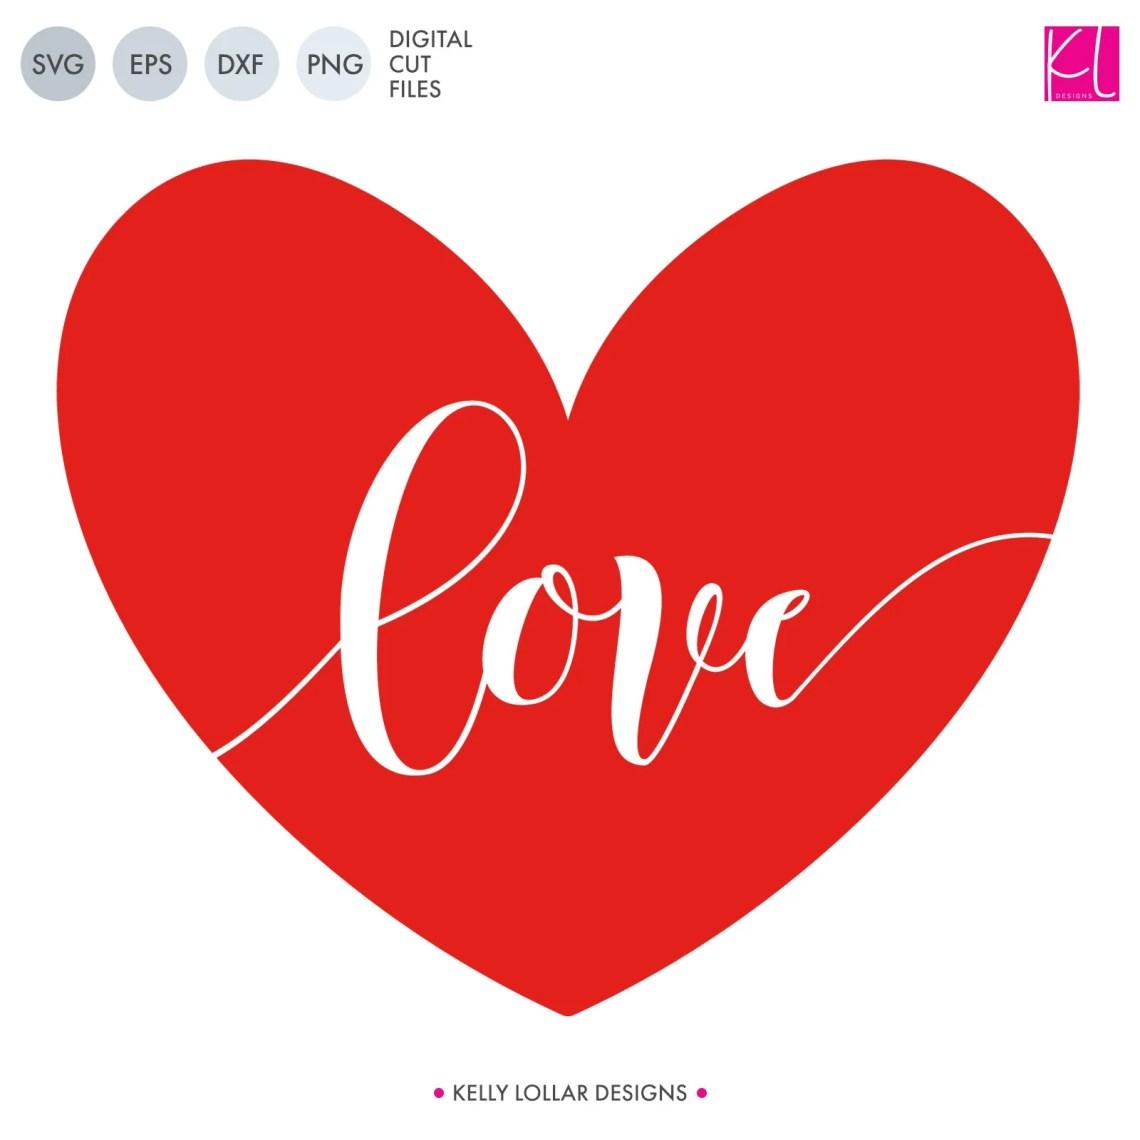 Download Free Love Heart SVG Cut Files - Kelly Lollar Designs